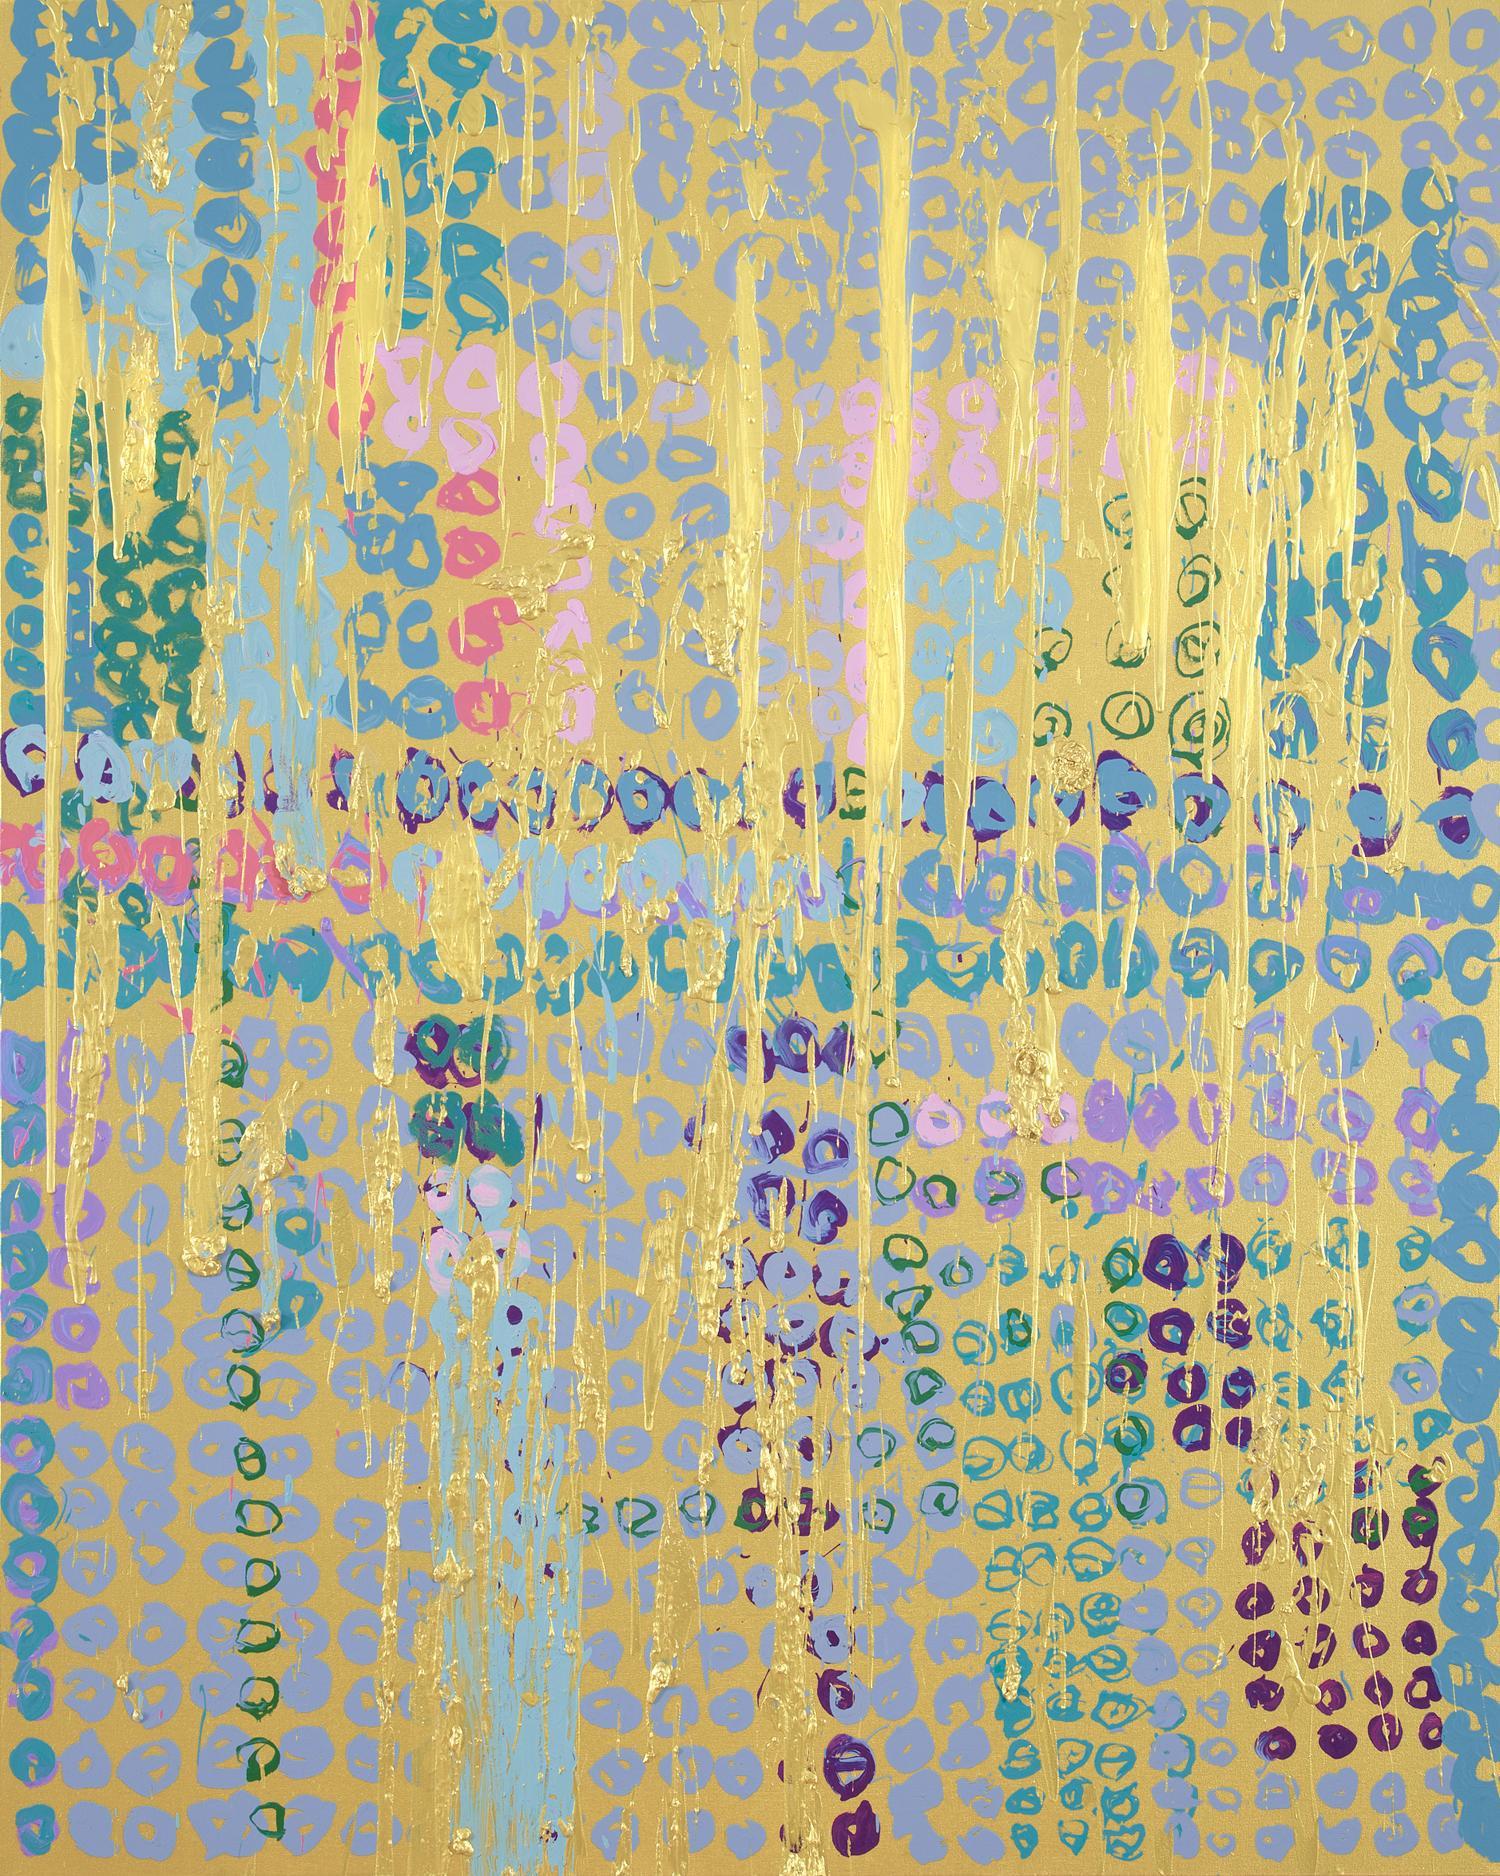 Margaret Evangeline Love Letter 6 Painting For Sale at 1stdibs